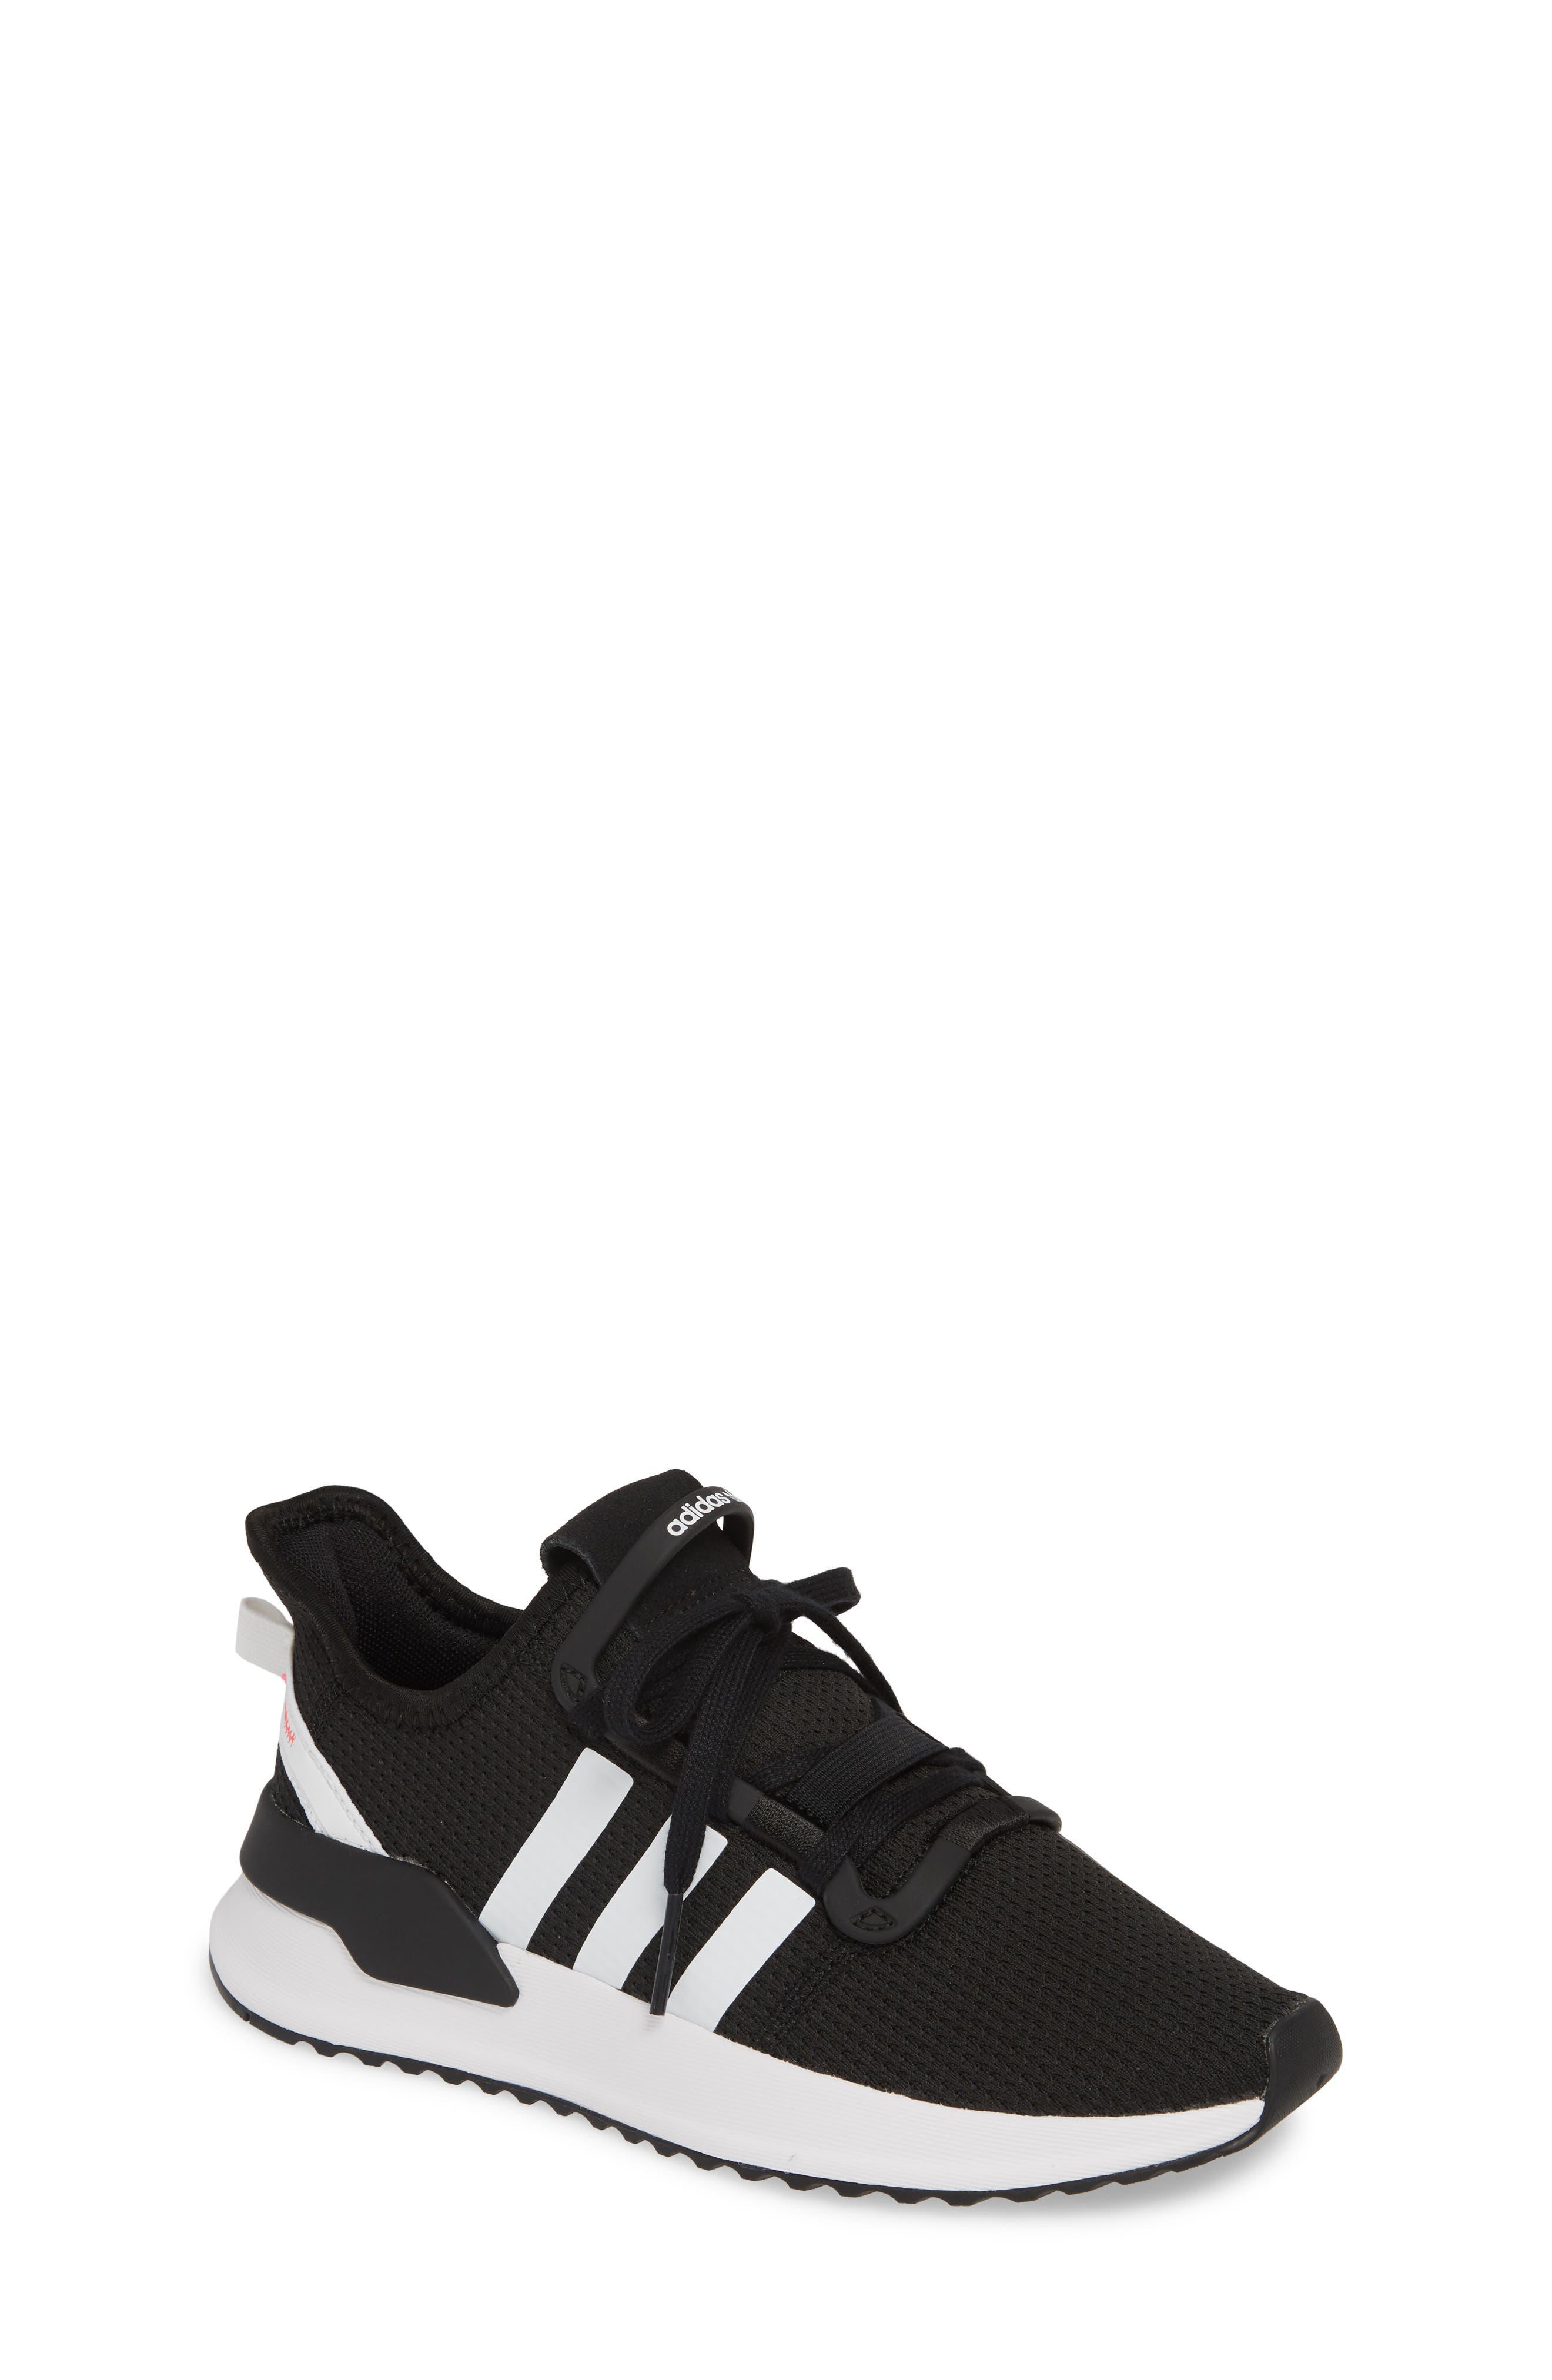 11c911e8b3e78 Big Girls  Adidas Shoes (Sizes 3.5-7)